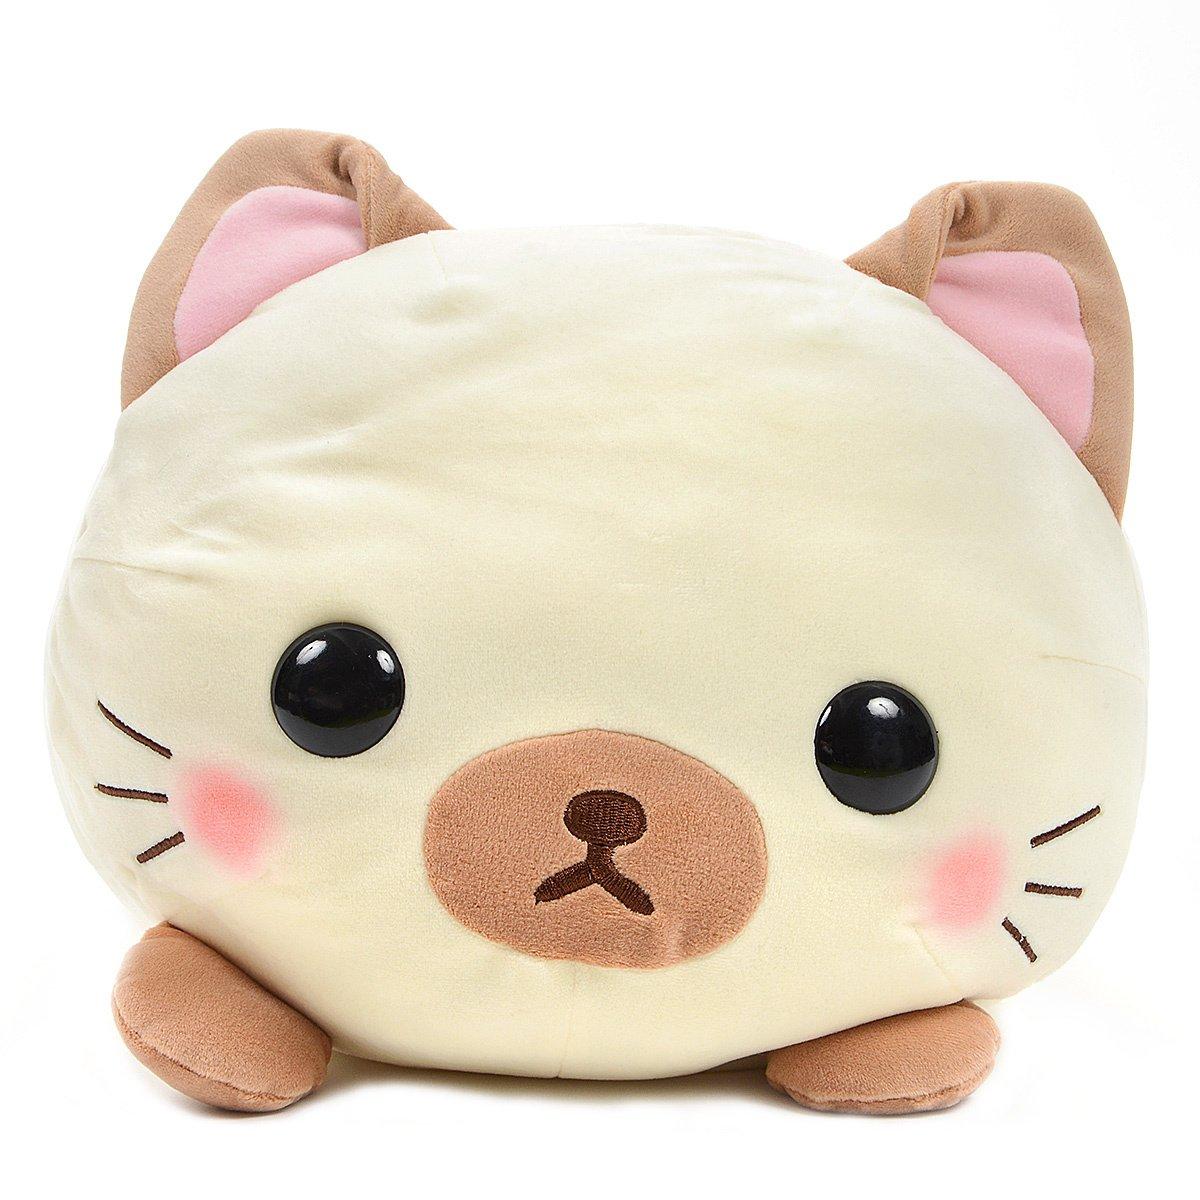 Mochikko Neko Nyanzu Beige Cat Plush Amuse Super Soft JapanBIG Size Shamu-nyan 15 Inches